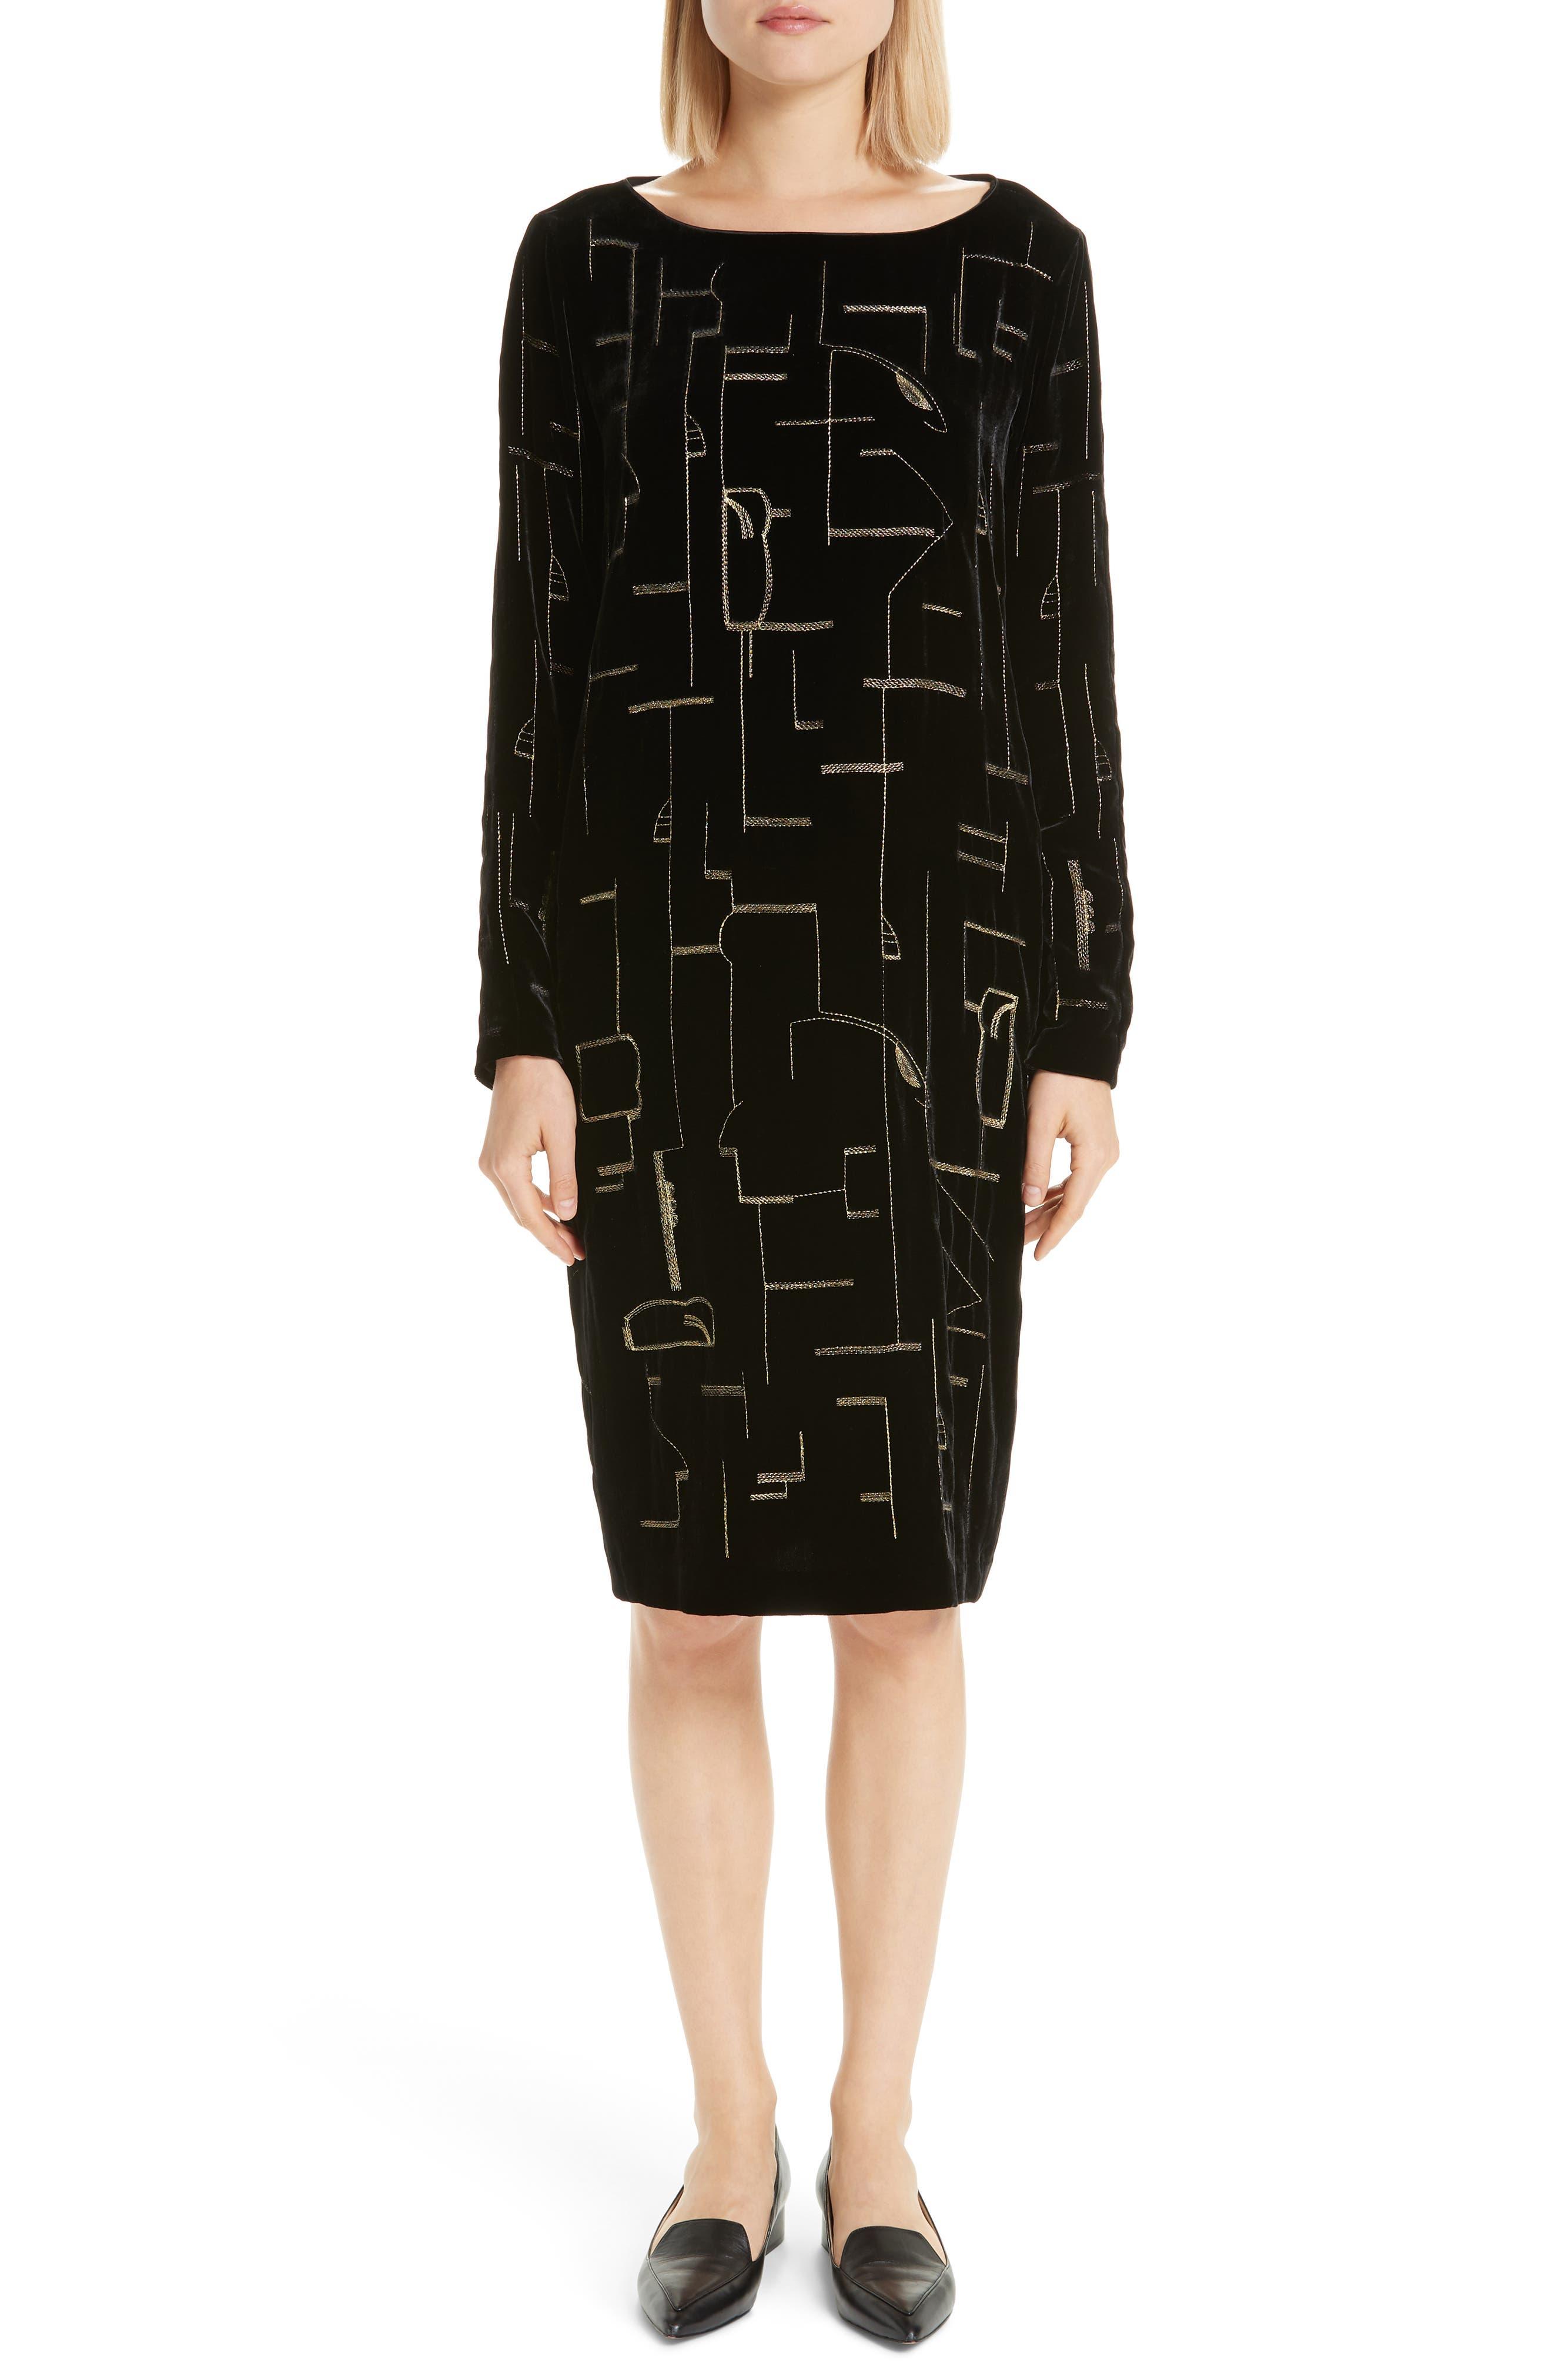 Lafayette 148 New York Cressida Embellished Velvet Dress, Black